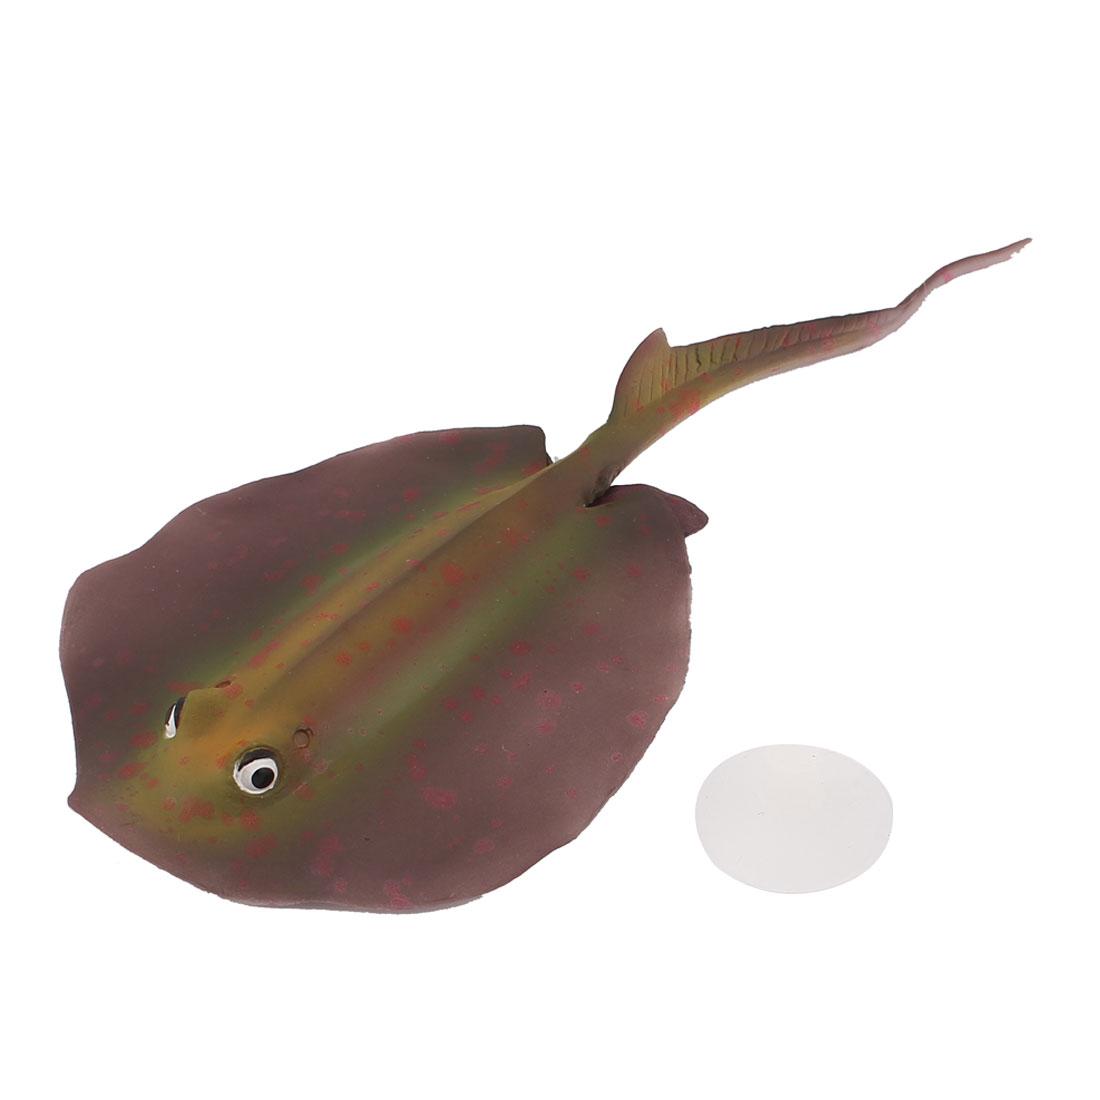 Thermoplastic Rubber Aquarium Fish Tank Artificial Stingray Ornament 19x8.5CM Brown Red